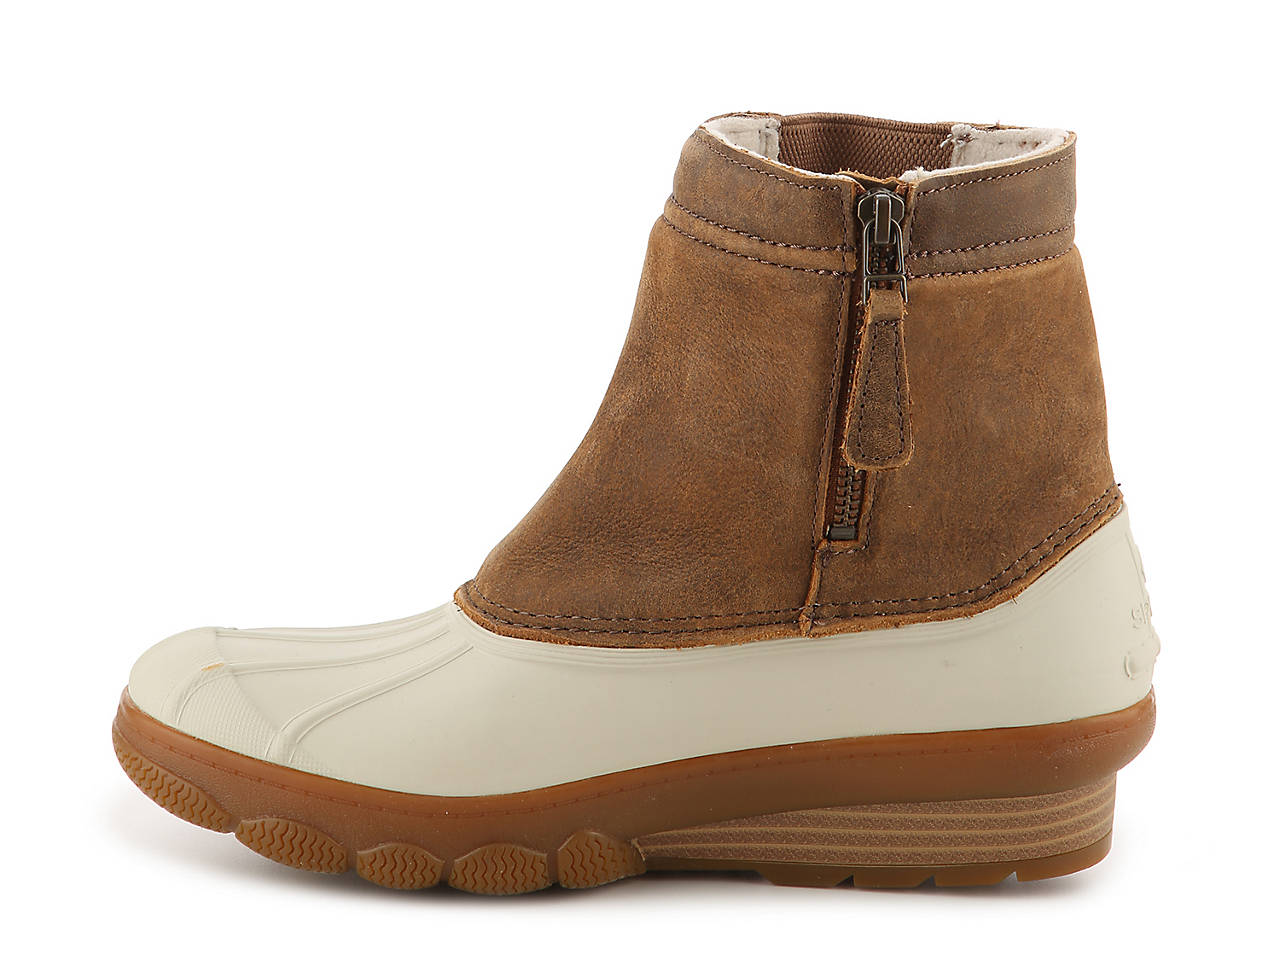 0ecc555bf68 Sperry Top-Sider Saltwater Spray Wedge Duck Boot Women s Shoes